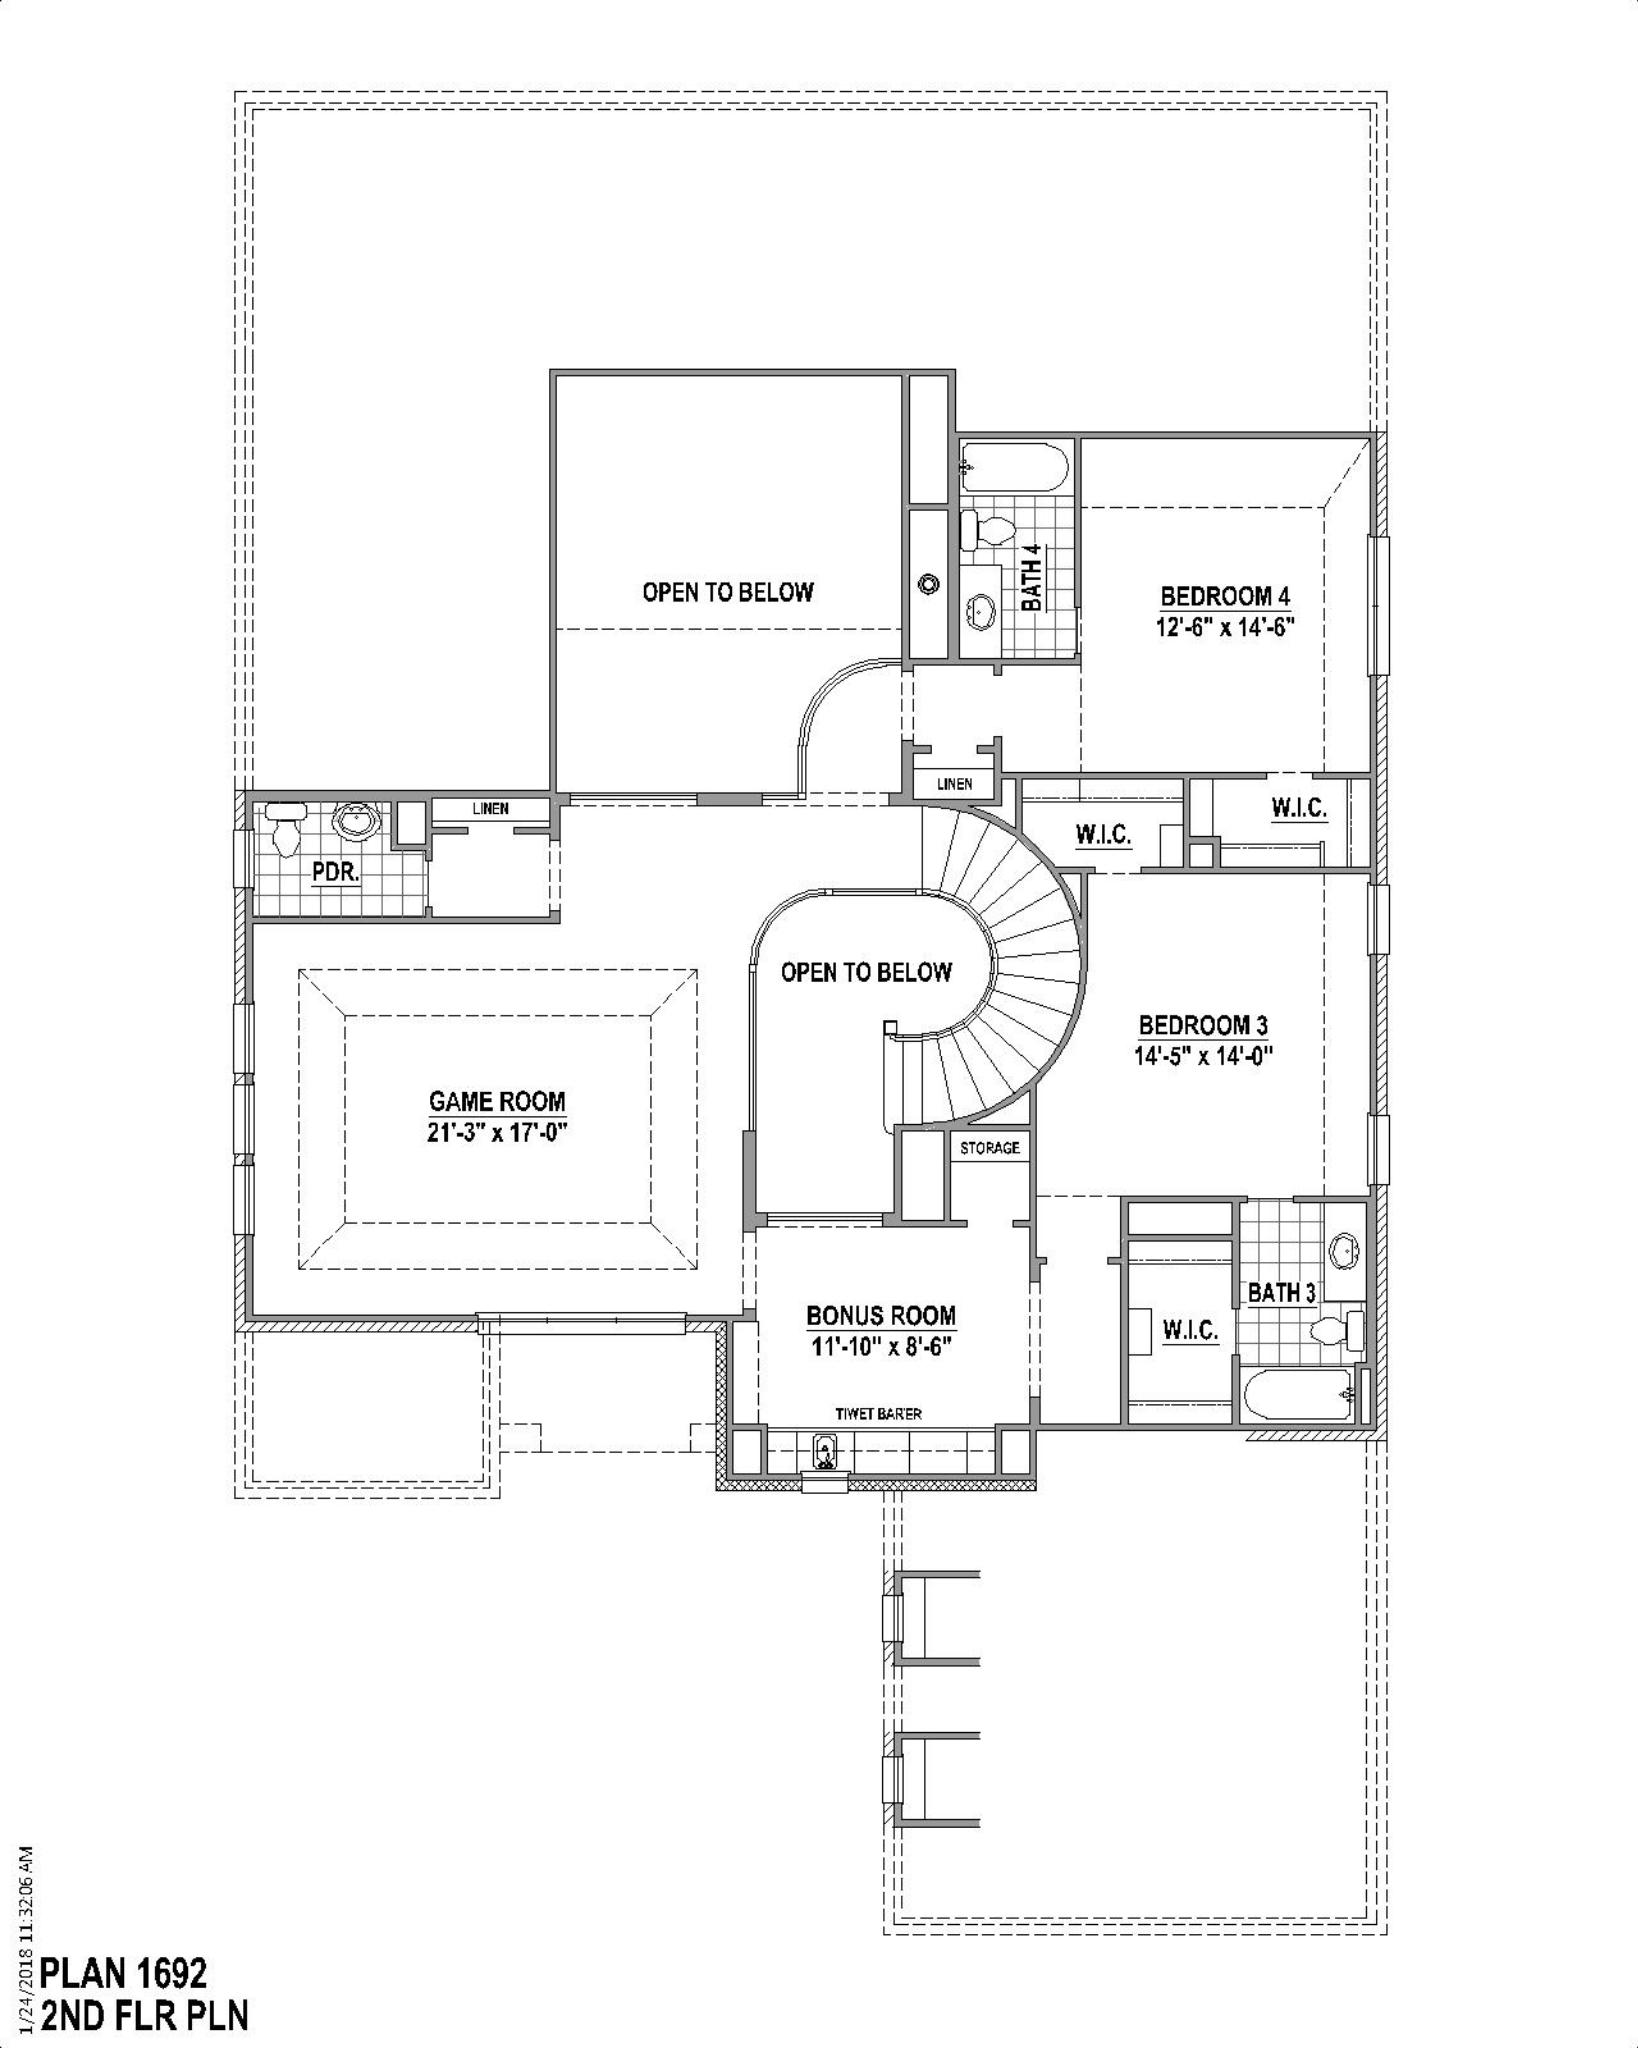 Plan 1692 Floor Plan